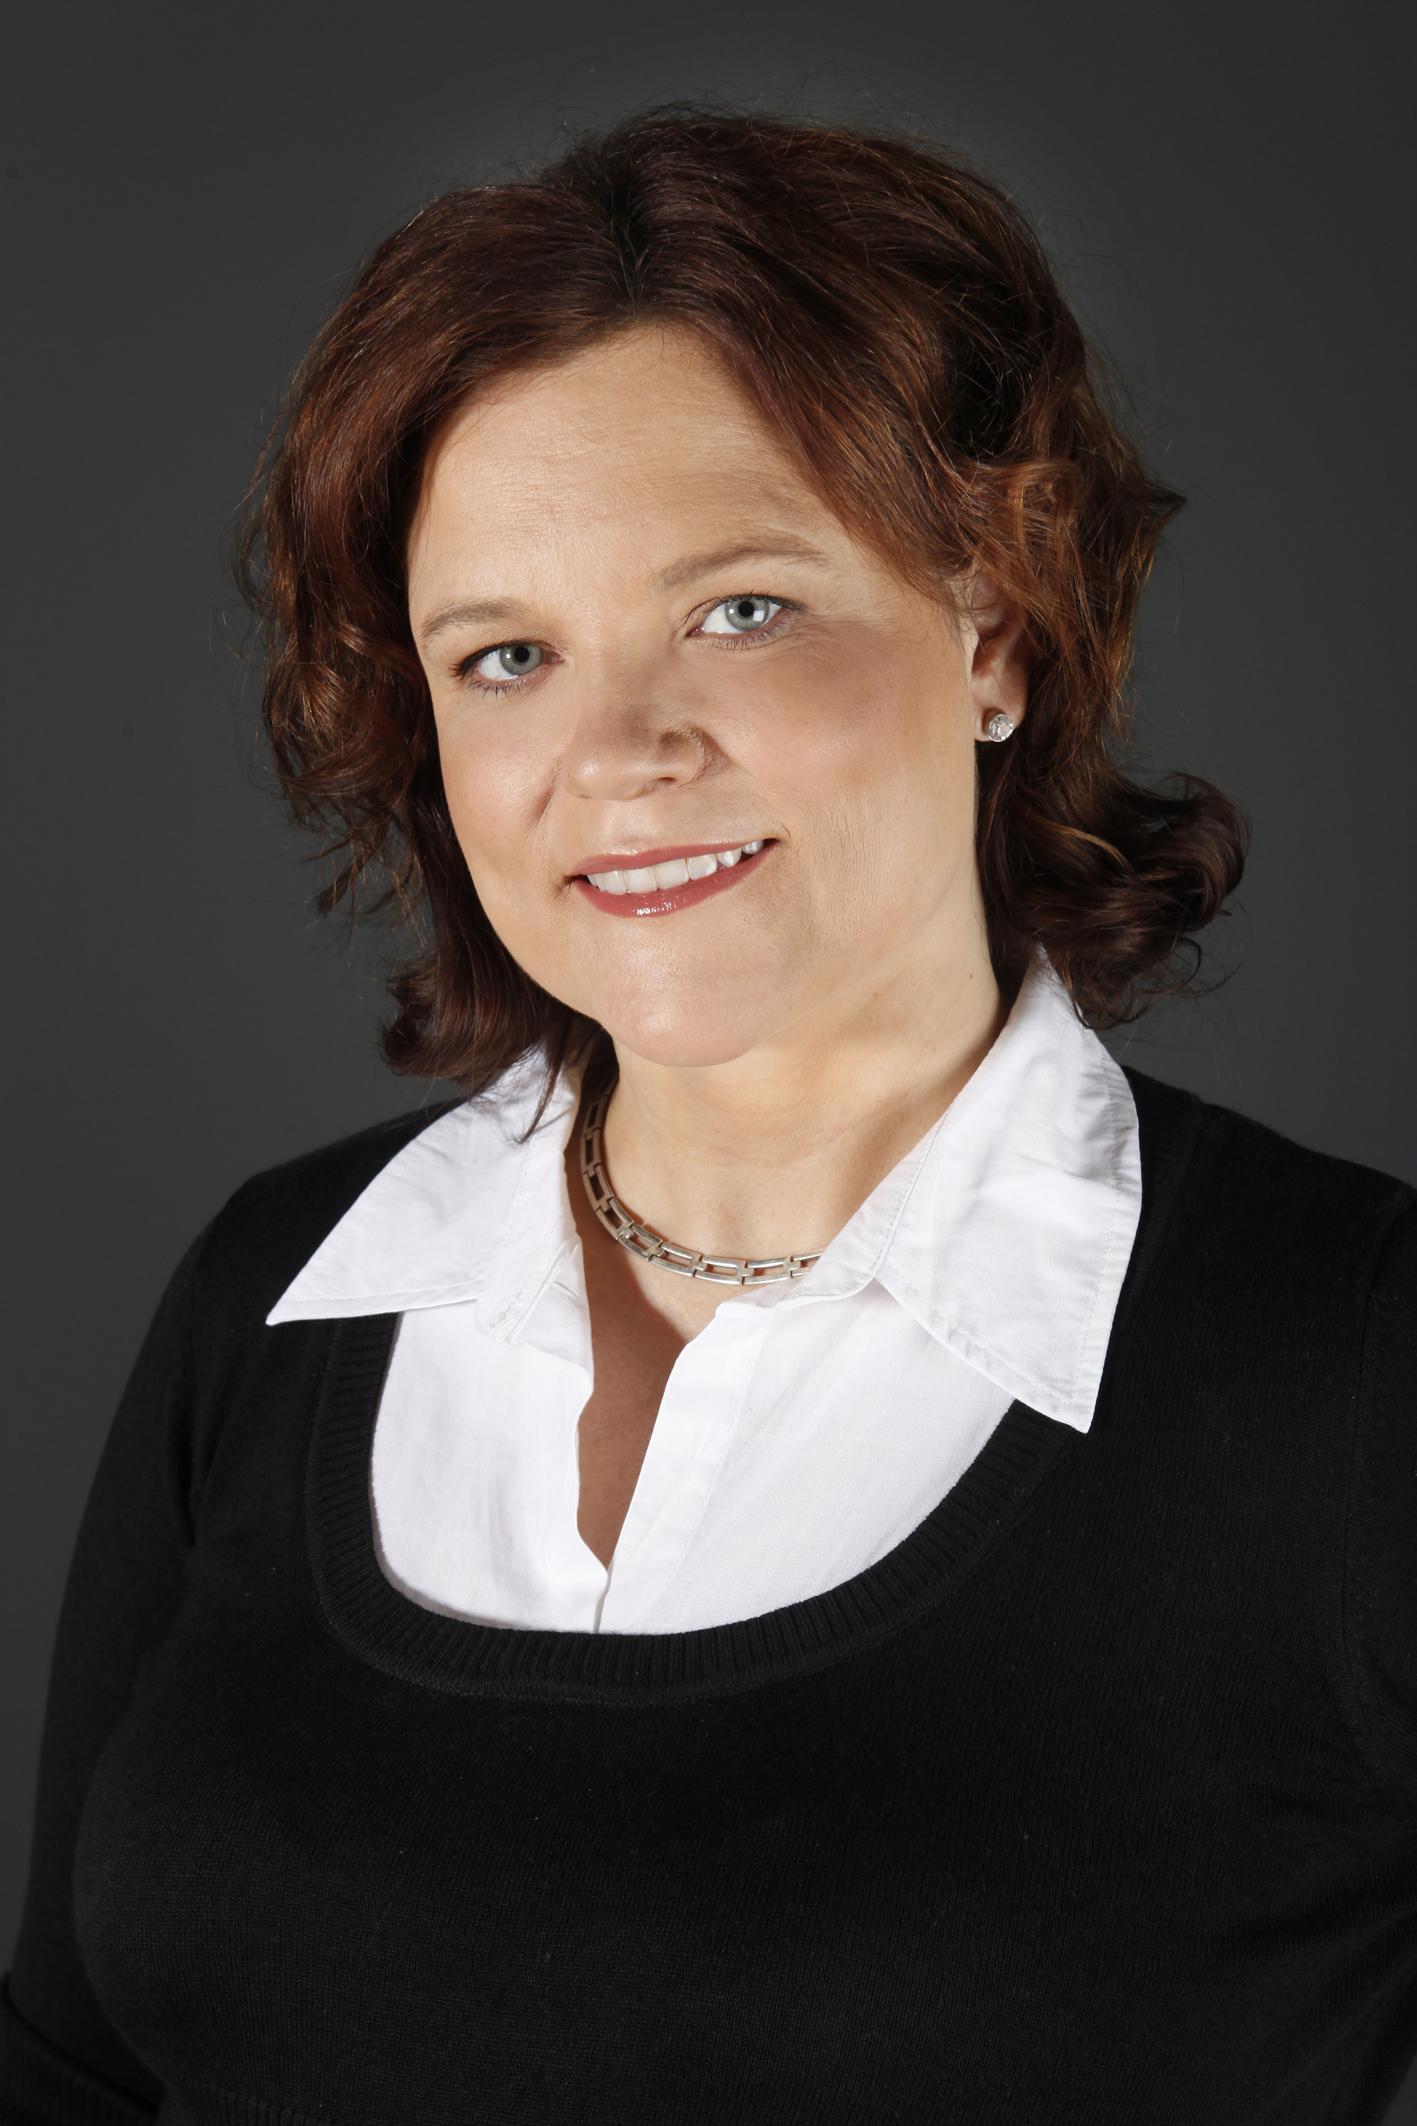 Catrin Mattsson